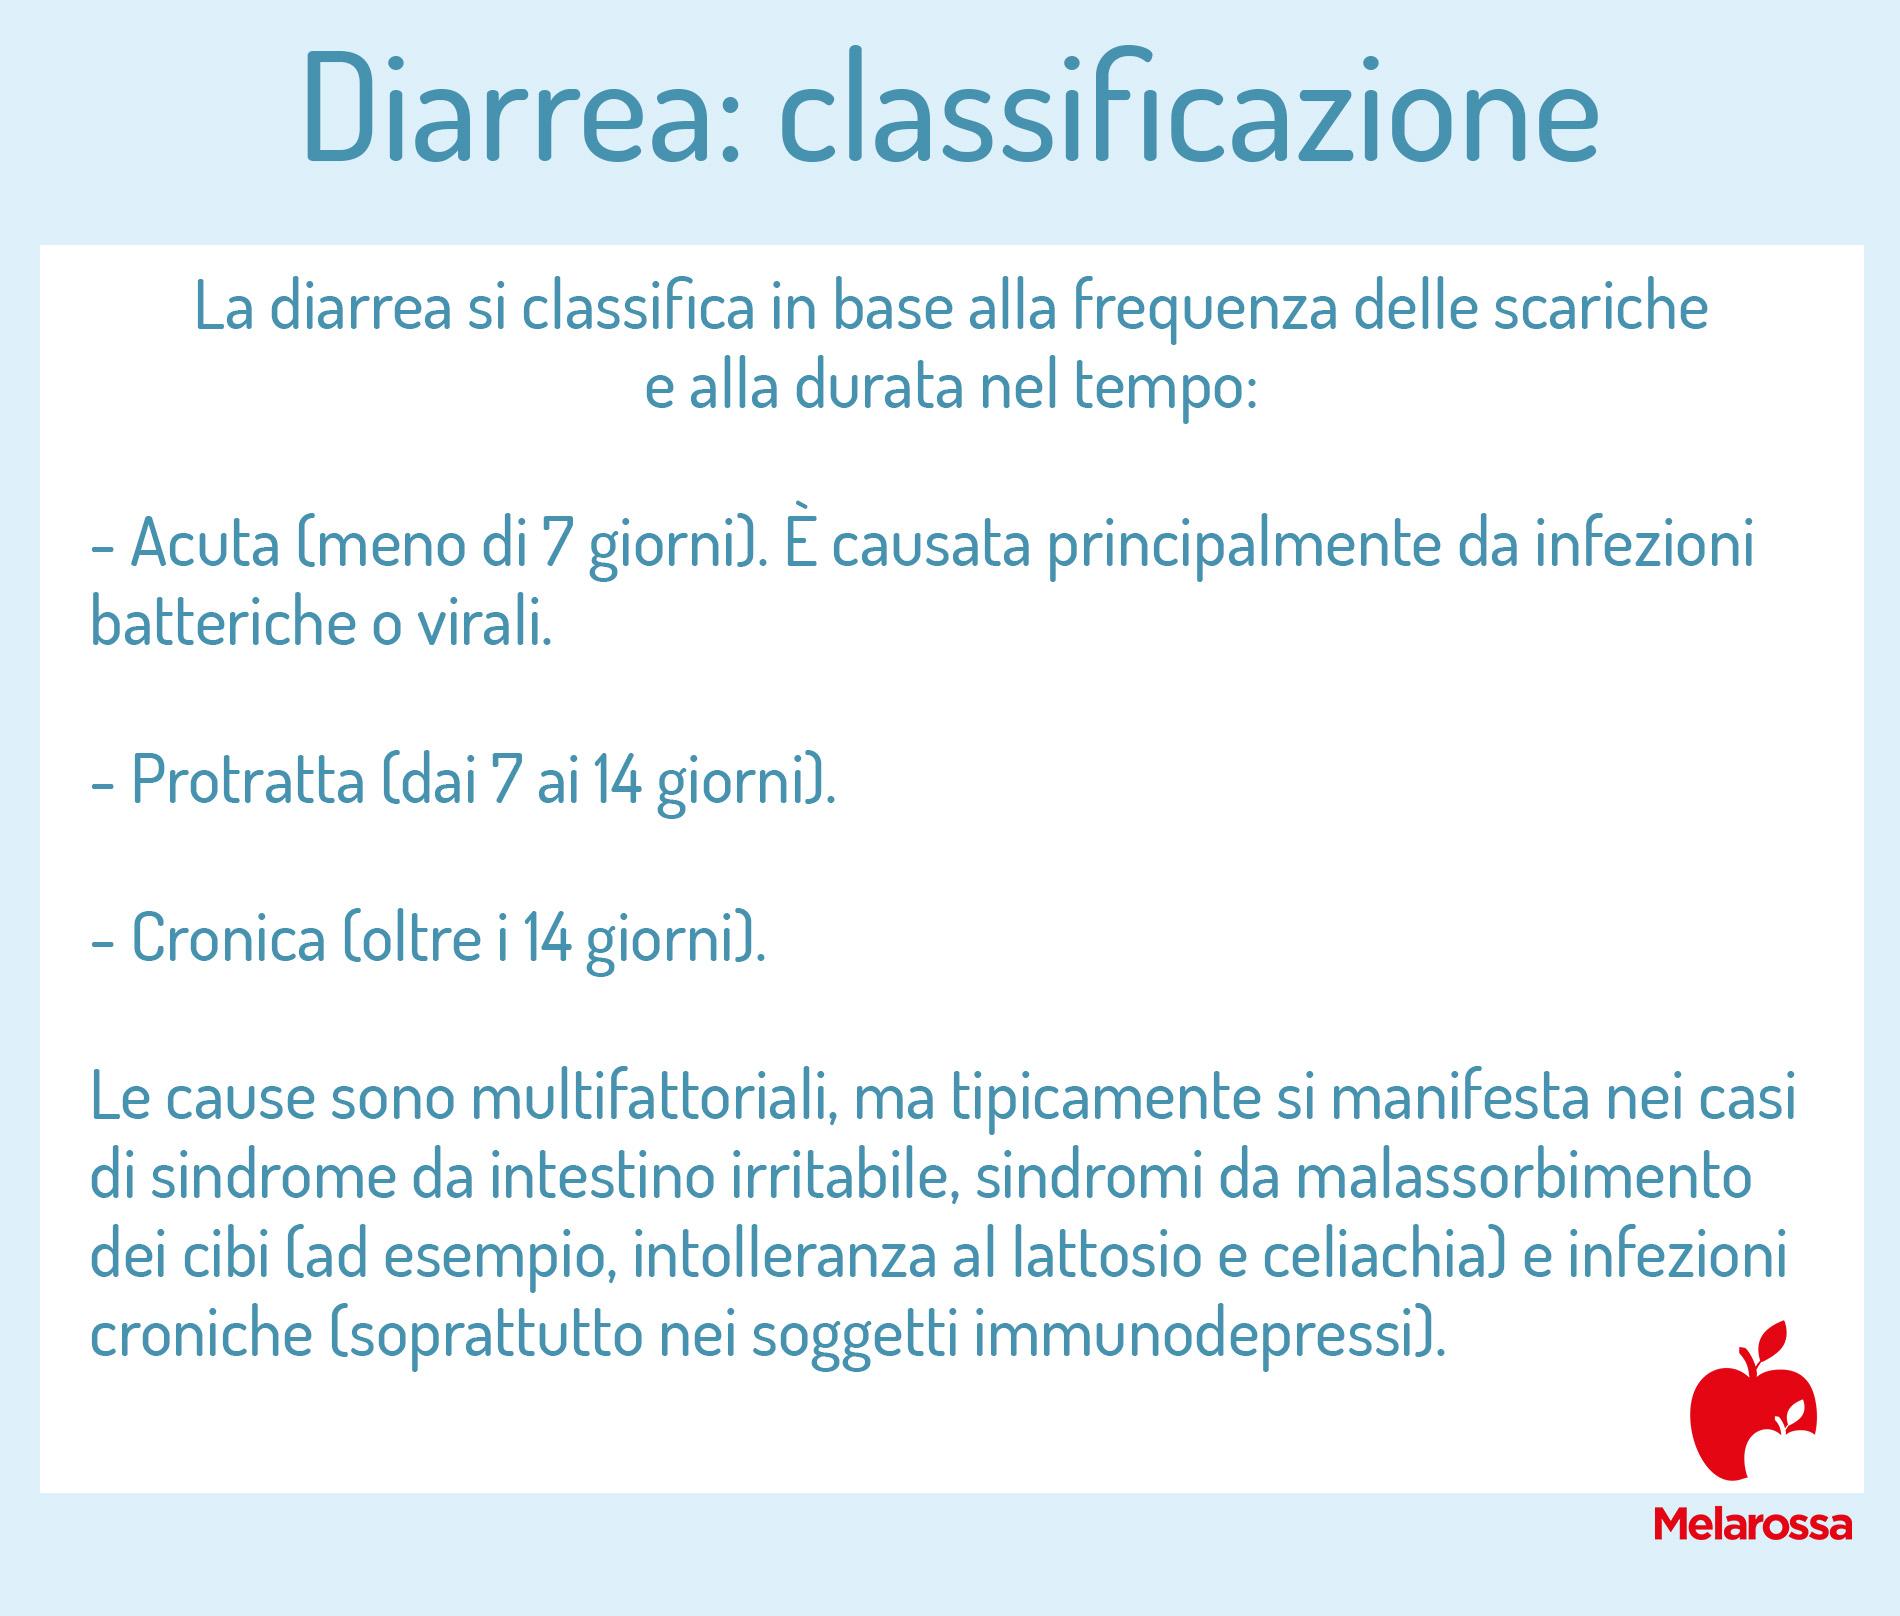 diarrea: classificazione